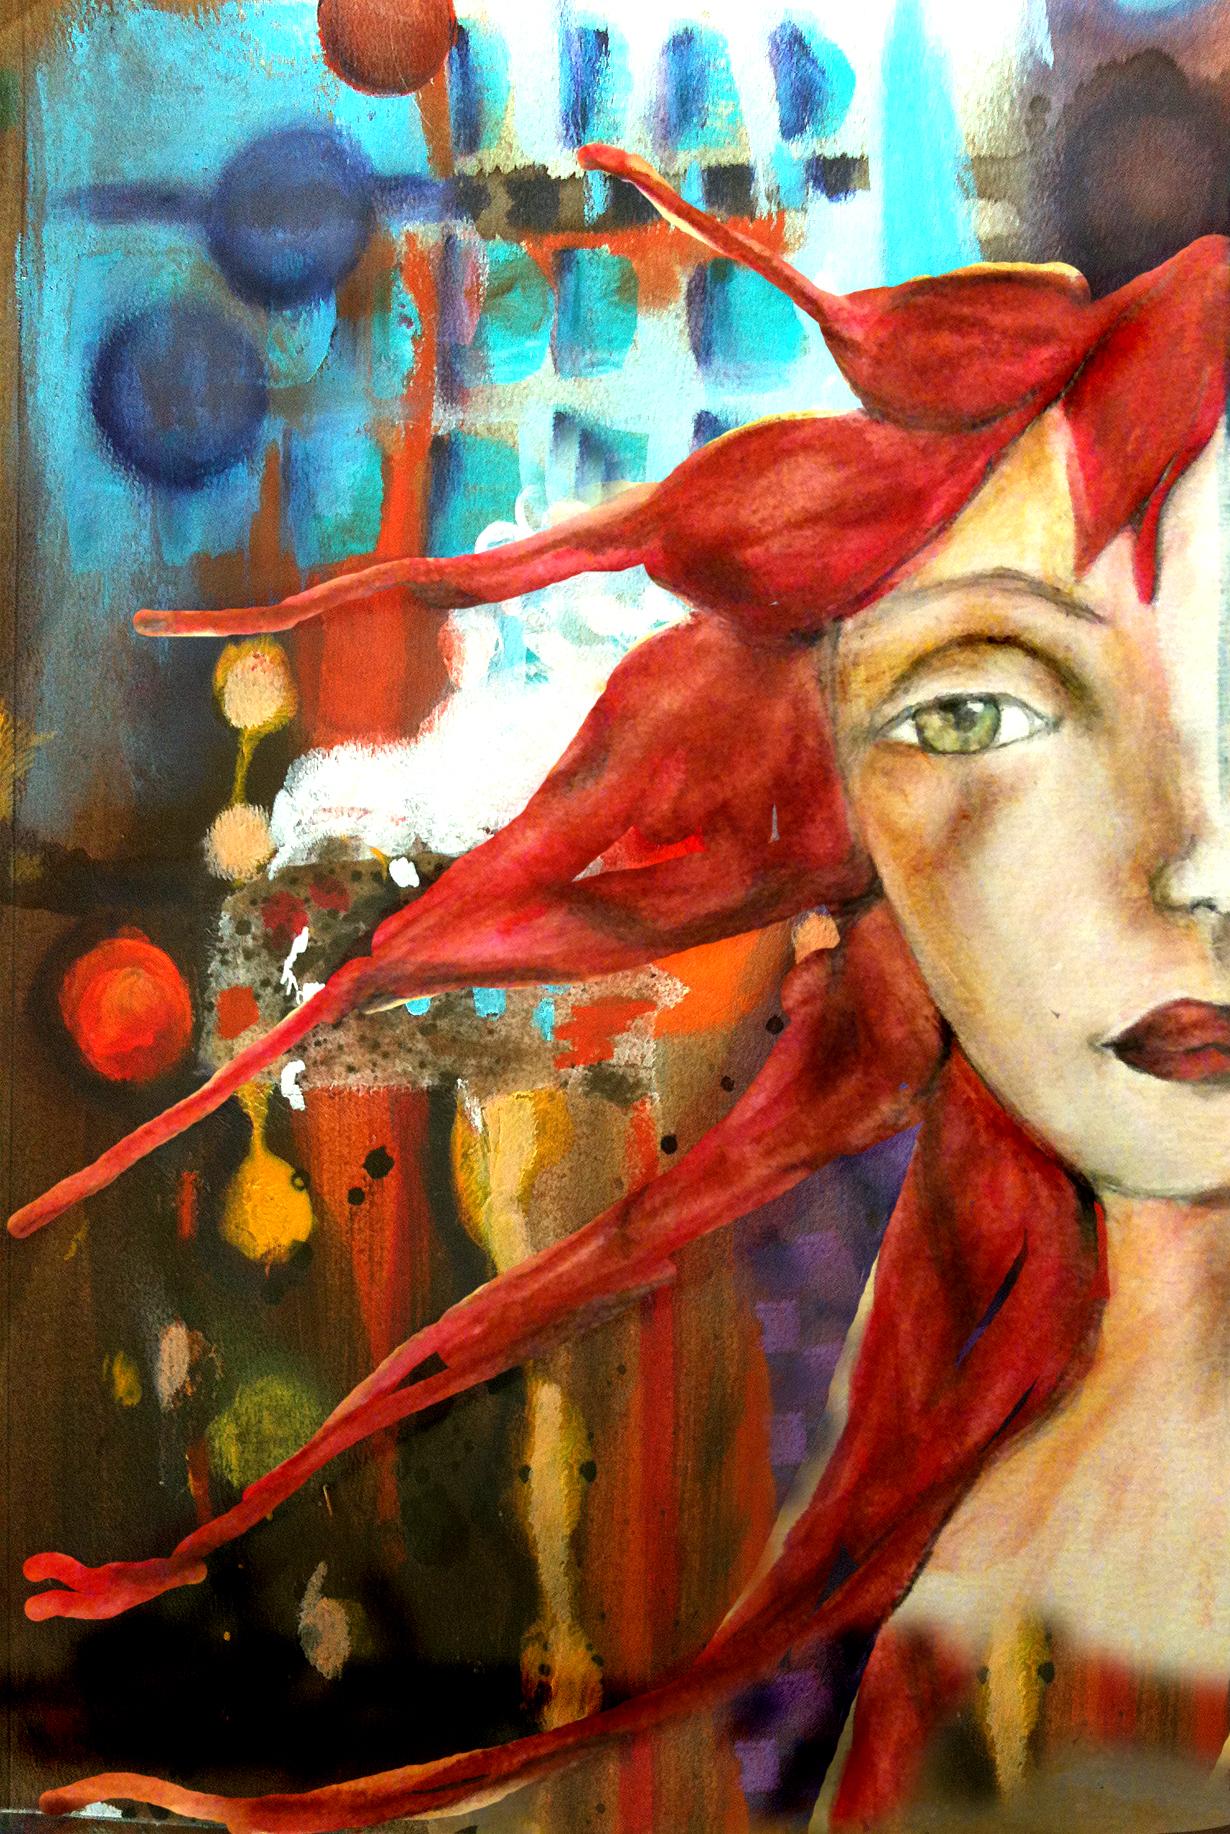 Fonda Haight - red head girl journal page copy.jpg